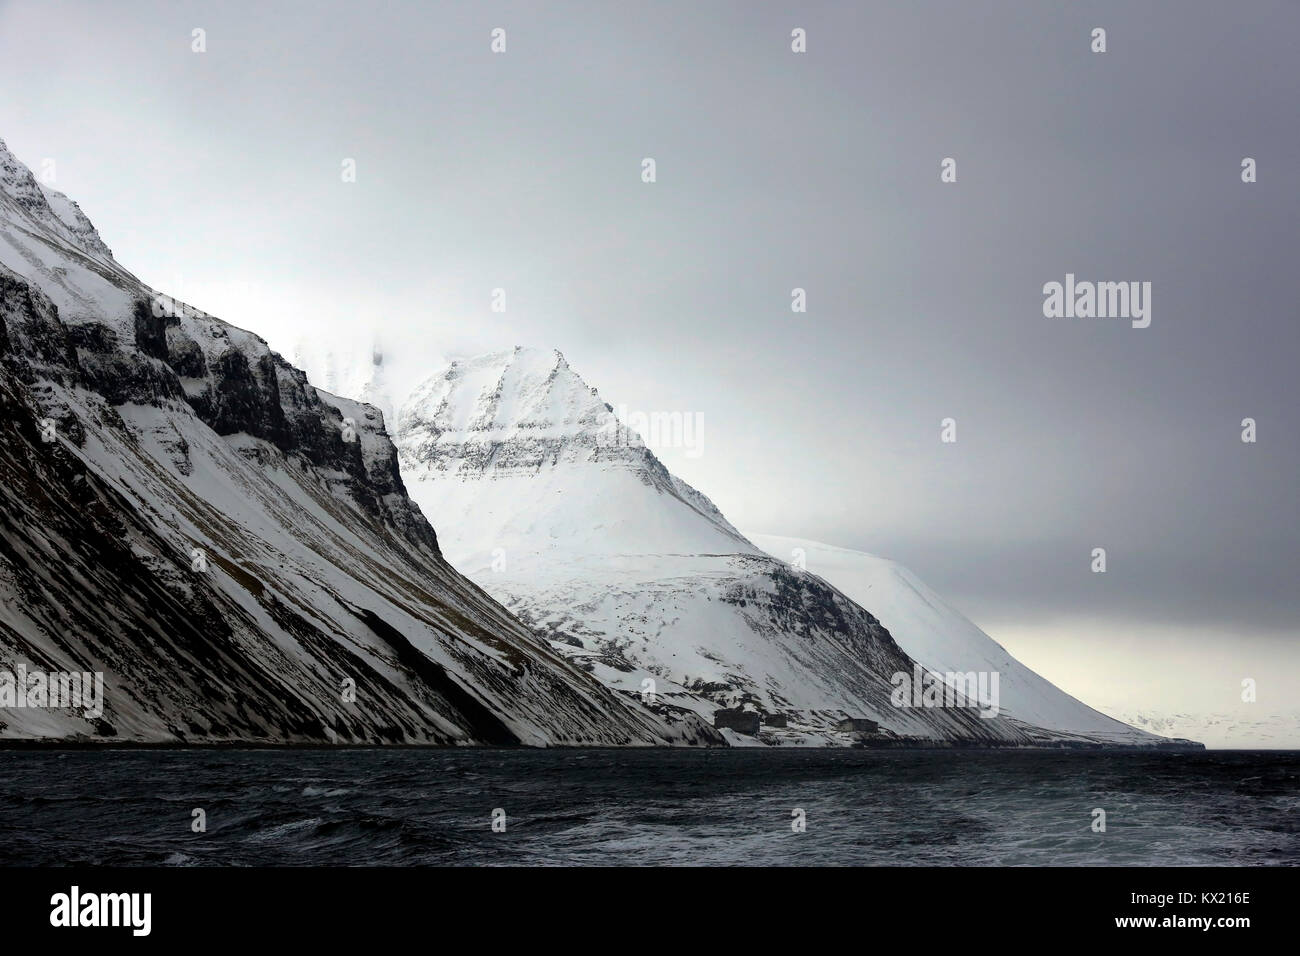 Mountains outside Longearbyen, Viewed from Water. Svalbard, Norway - Stock Image